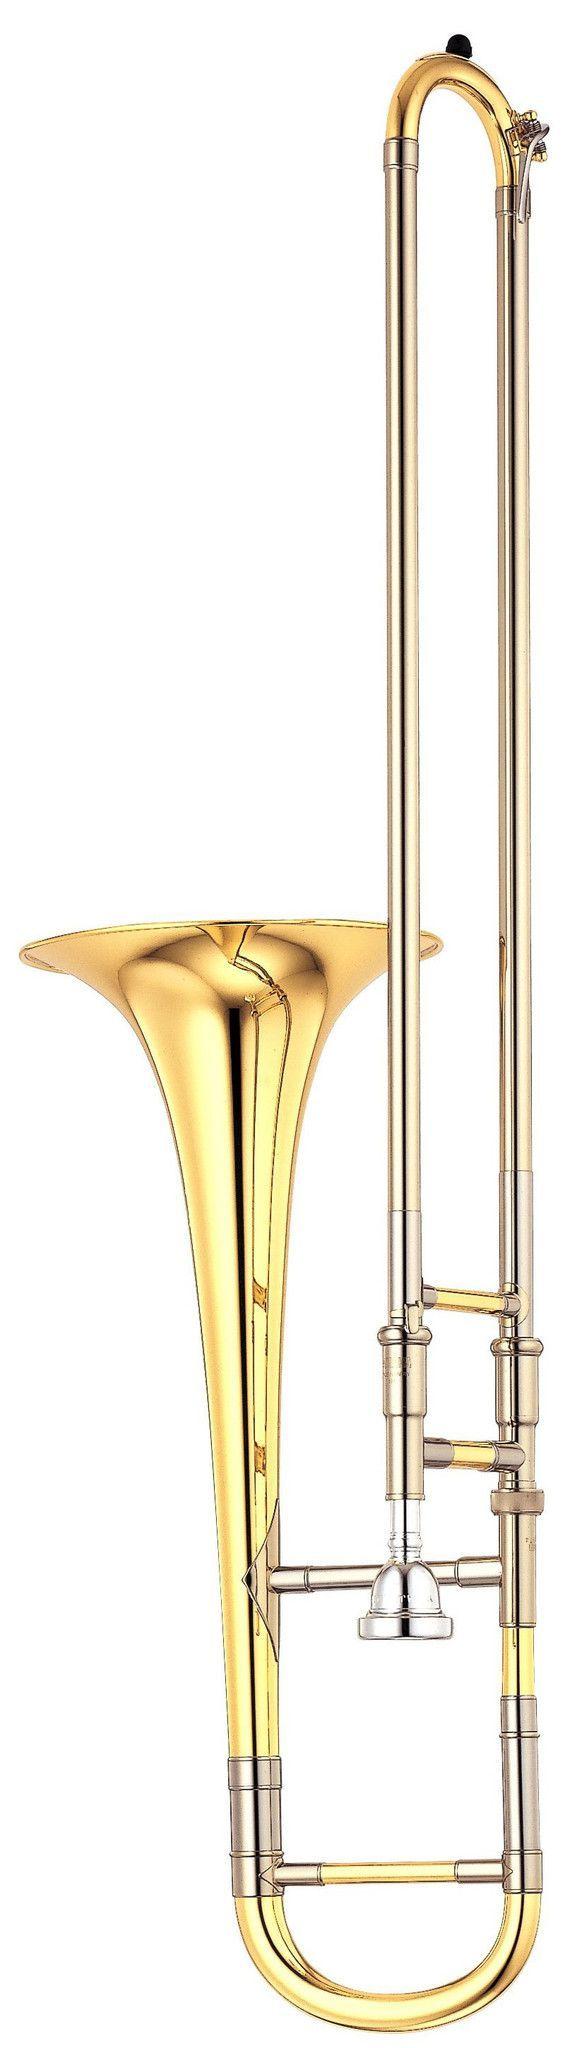 Yamaha YSL-871 Professional Custom Eb Alto Trombone